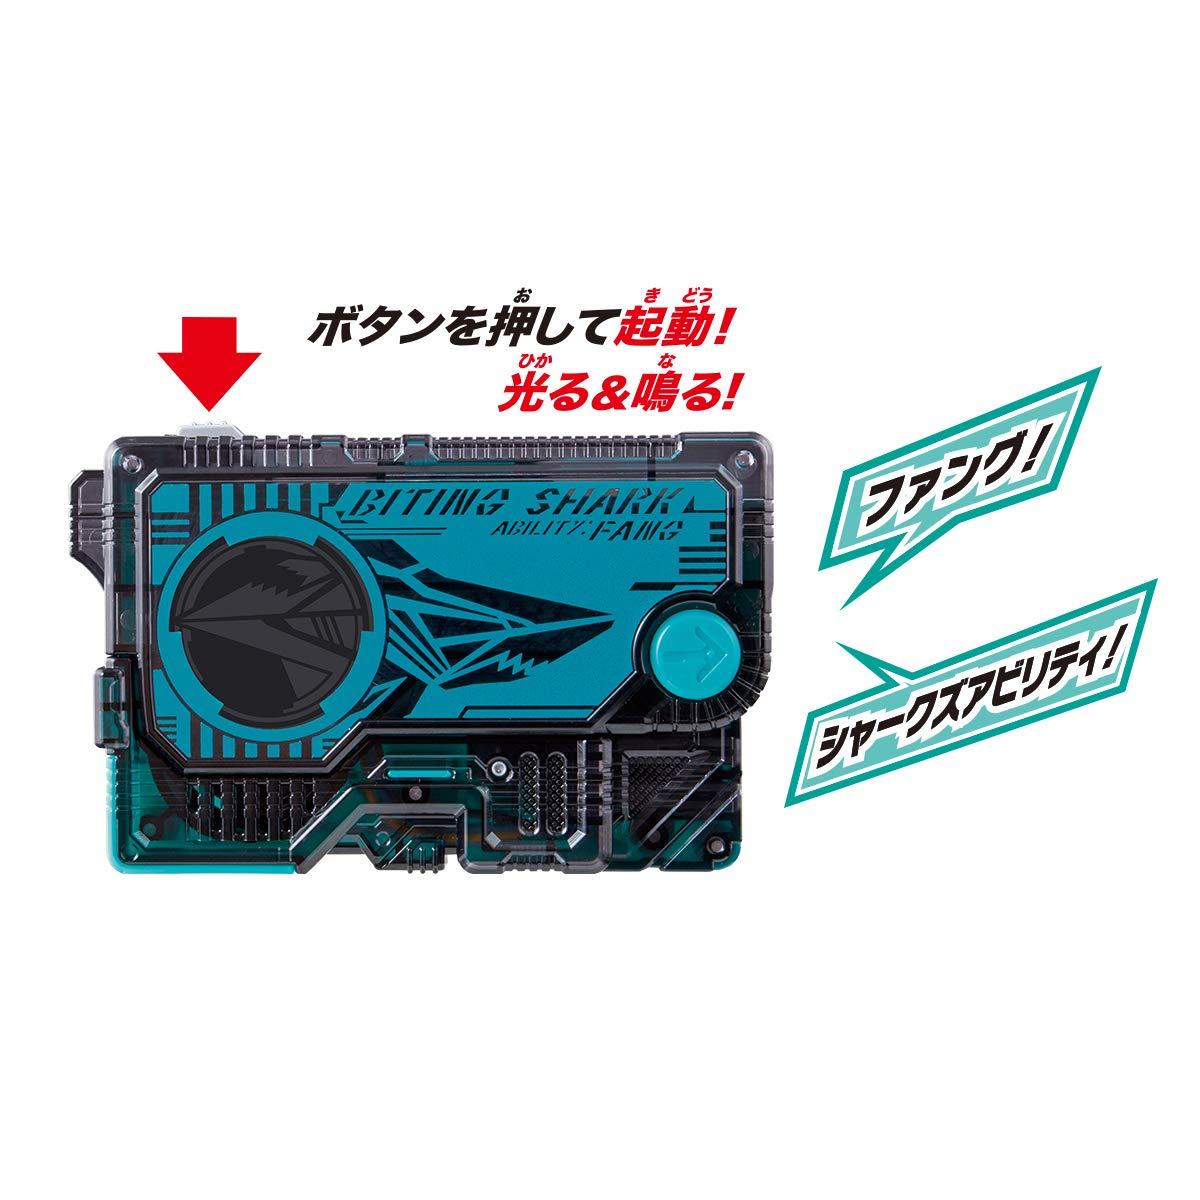 BANDAI 假面騎士ZERO-ONE DX Biting Shark 撕咬鯊魚 程式昇華之鑰【預購】【星野日本玩具】